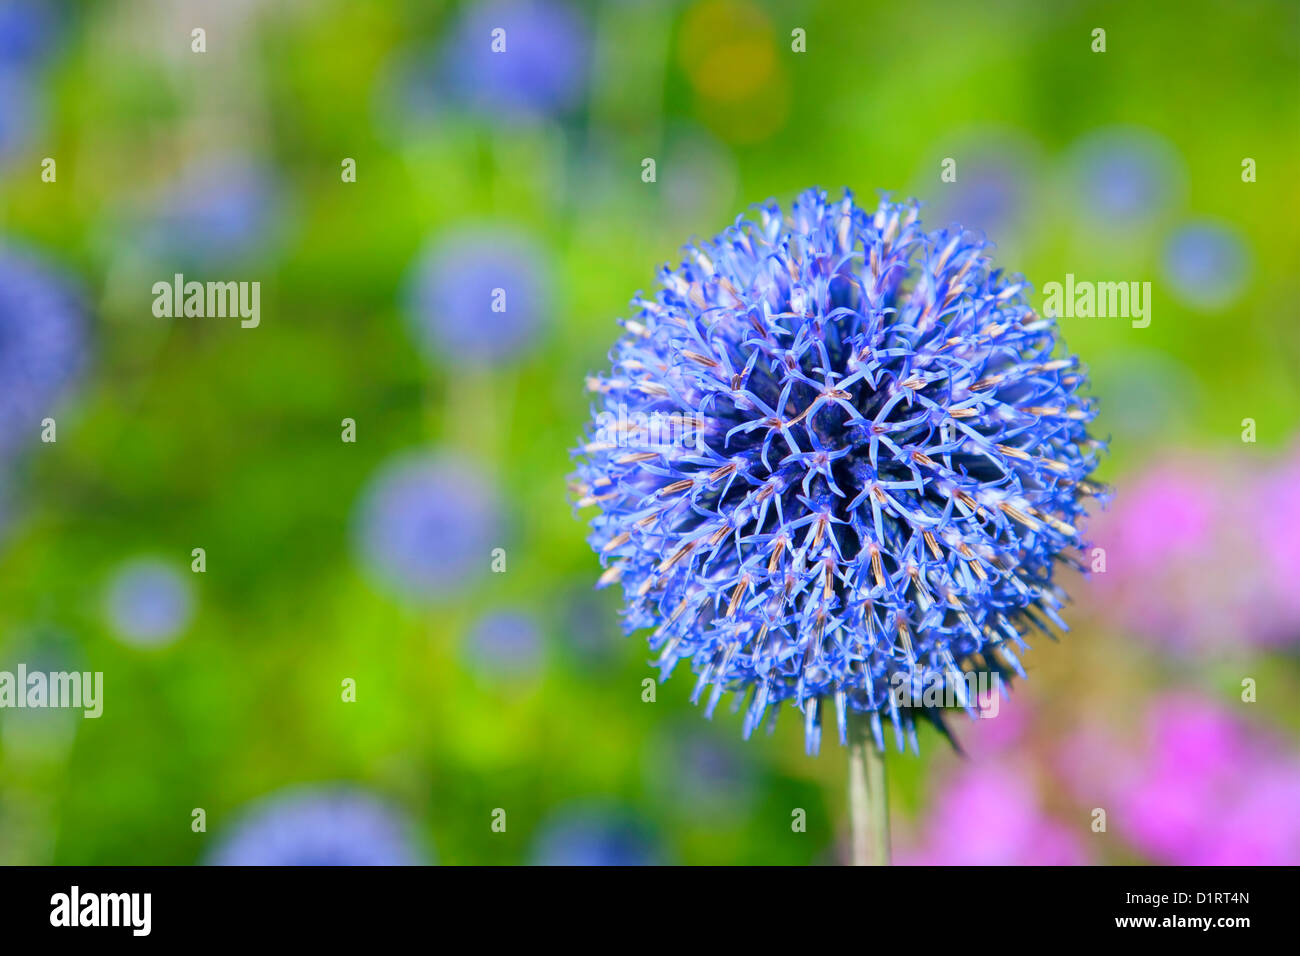 Flowering globe thistle in the summer garden. Selective focus. - Stock Image